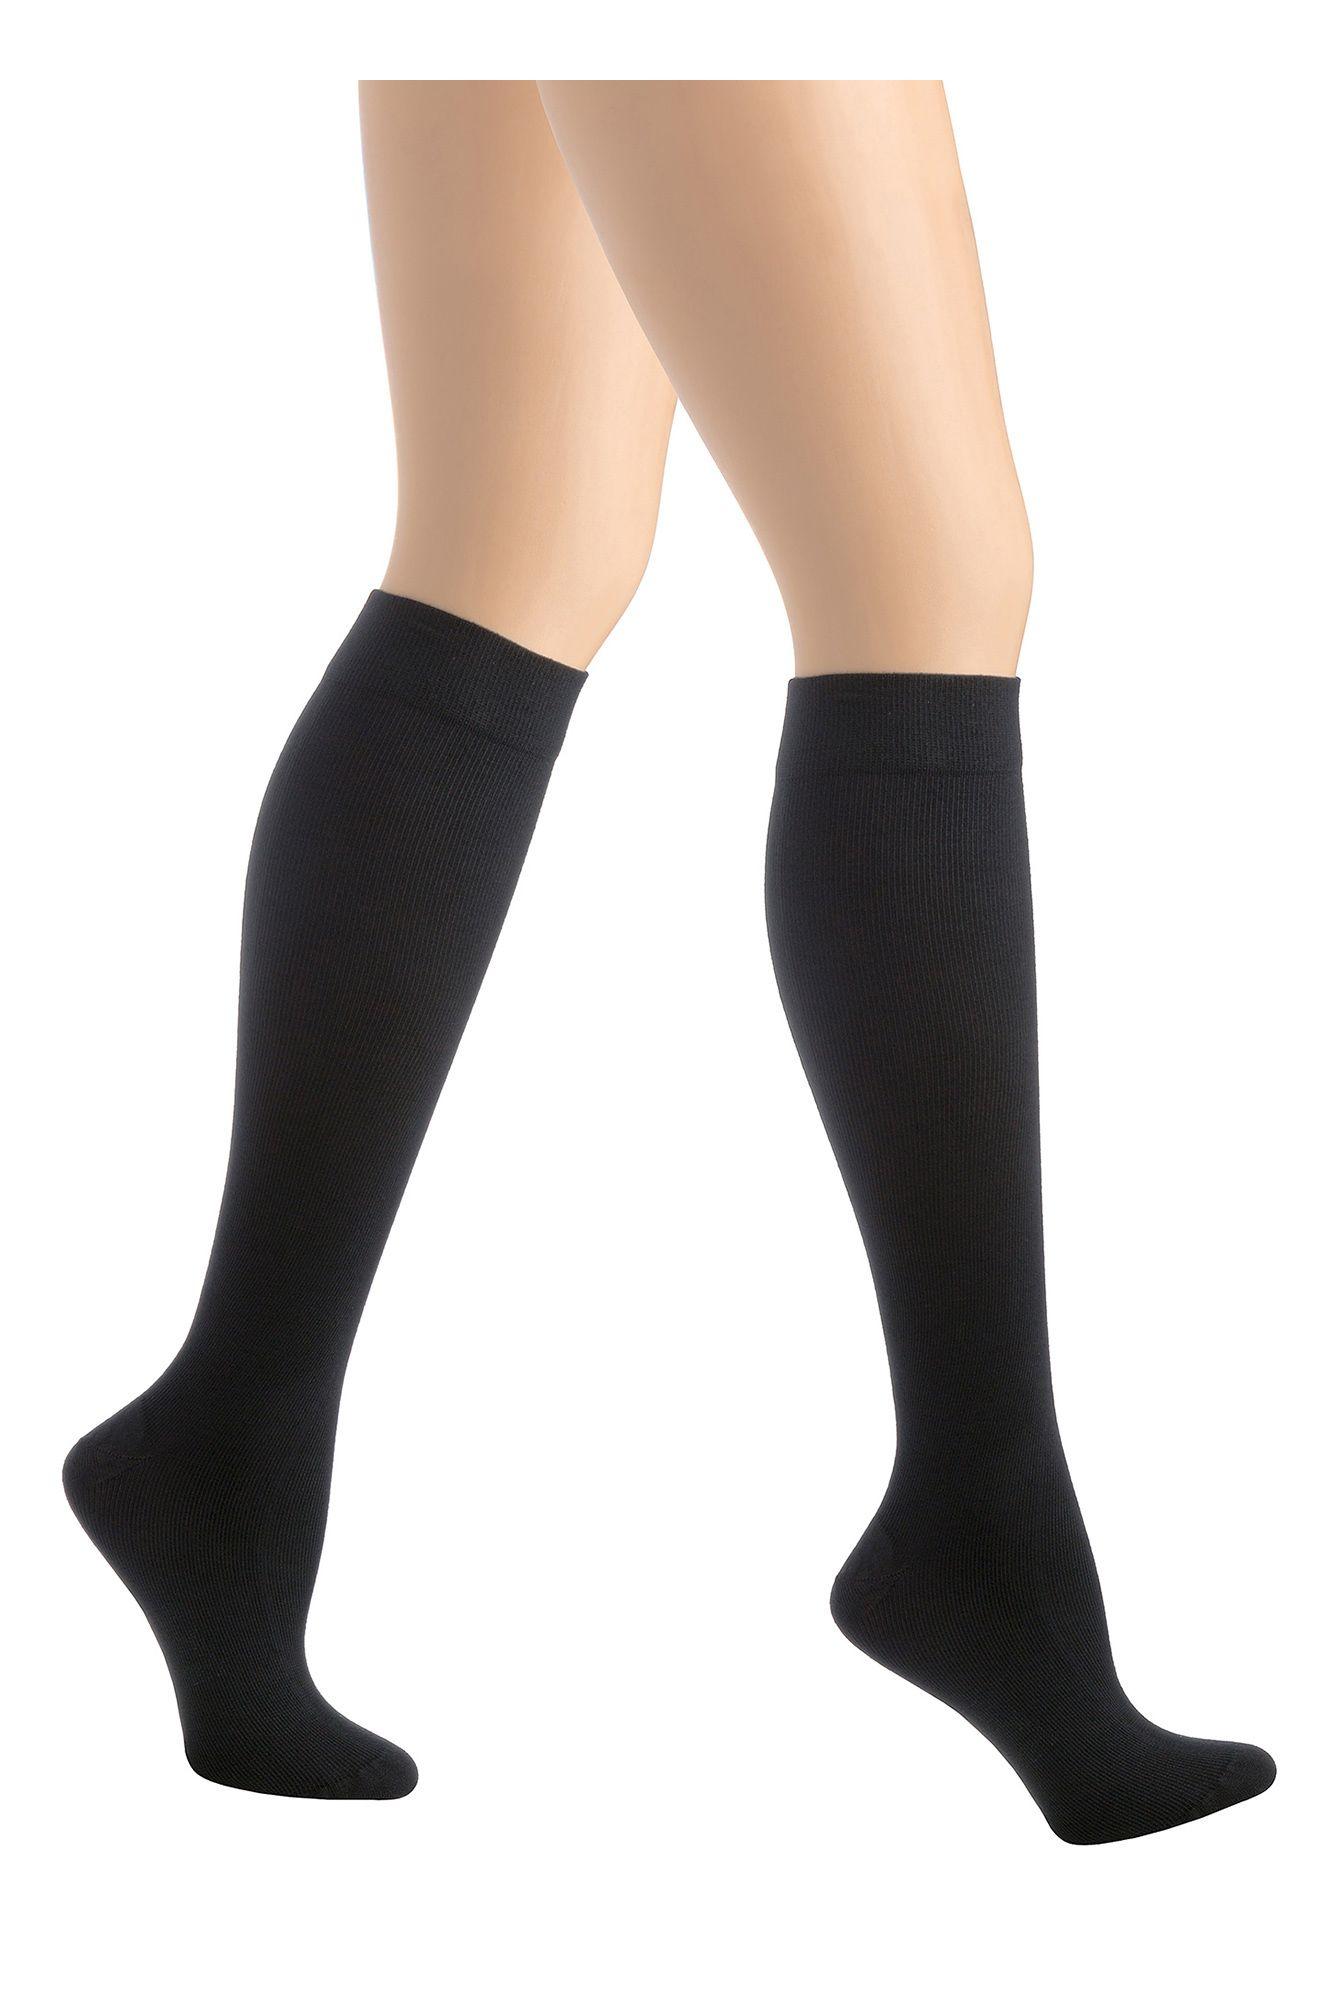 eeb5b2d4bf Activa Class 2 Unisex Support Socks - Daylong